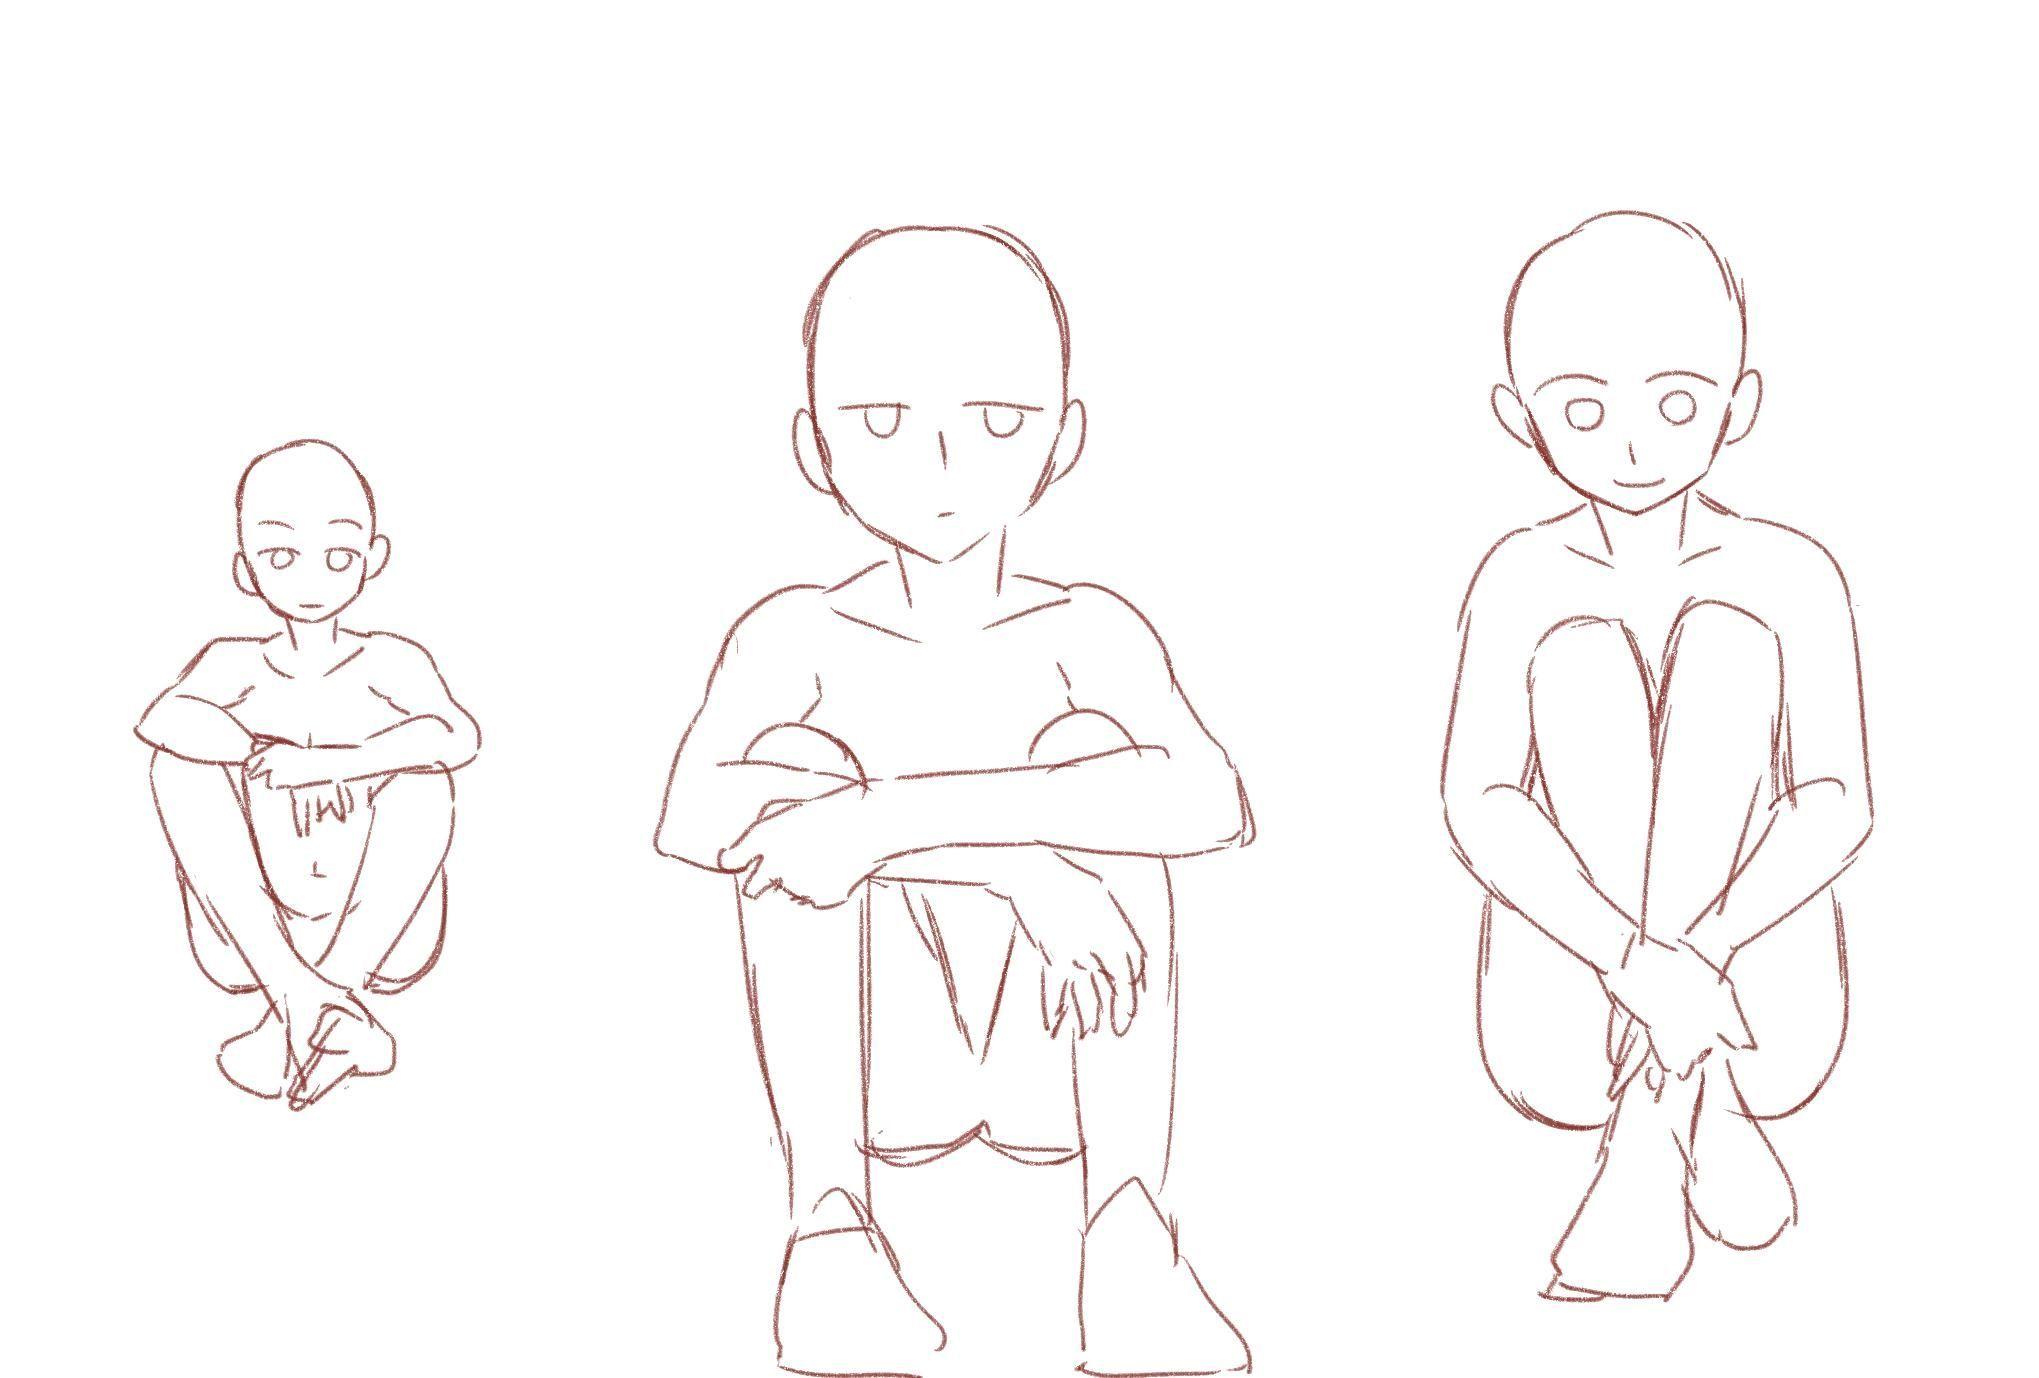 Male Anime Hair Styles Manga Hair Sketches Drawings